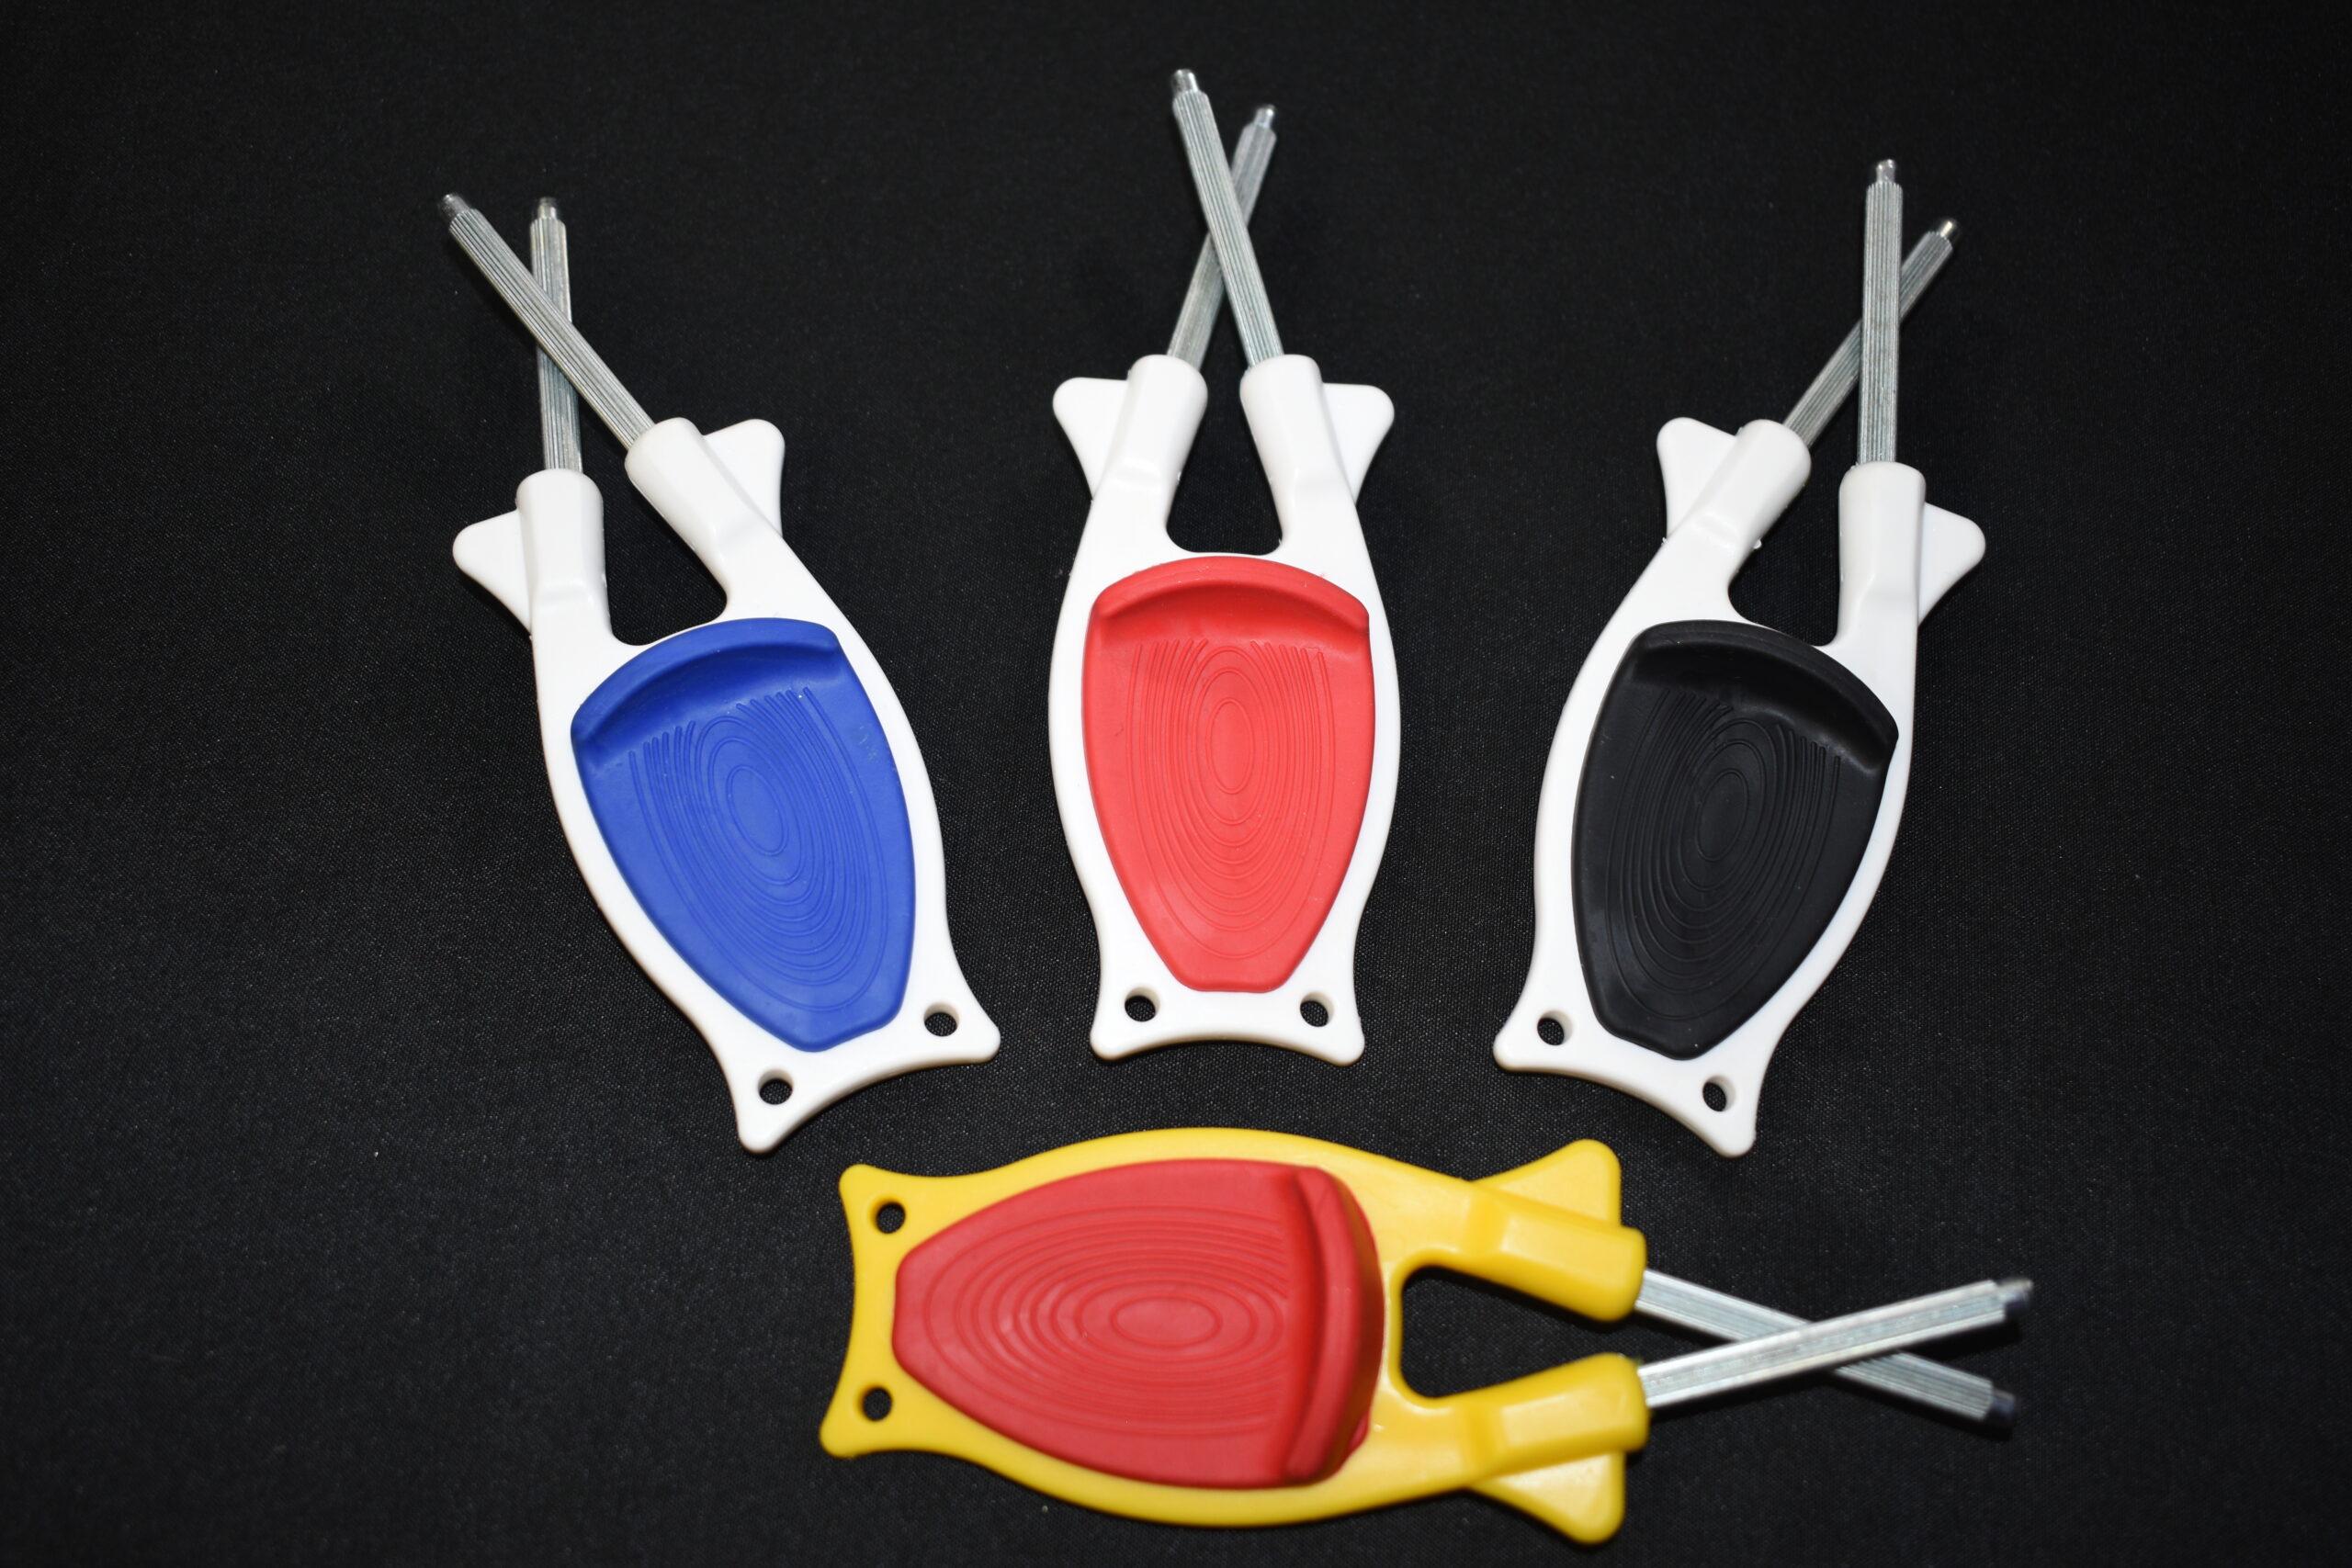 Knife sharpener set